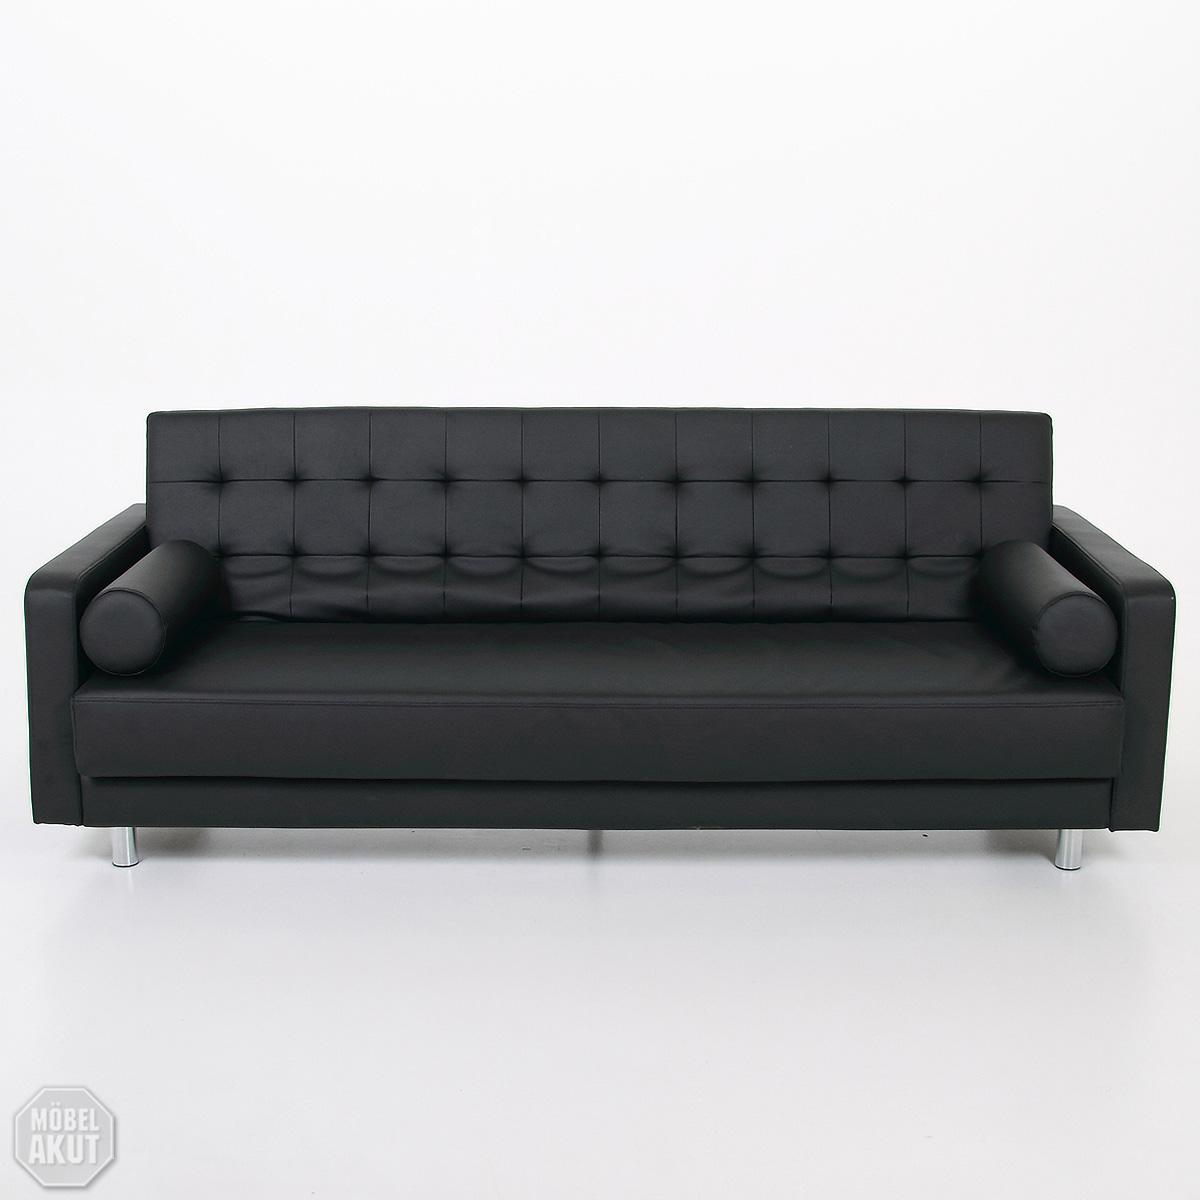 schlafsofa grando sofa schwarz bettfunktion neu. Black Bedroom Furniture Sets. Home Design Ideas